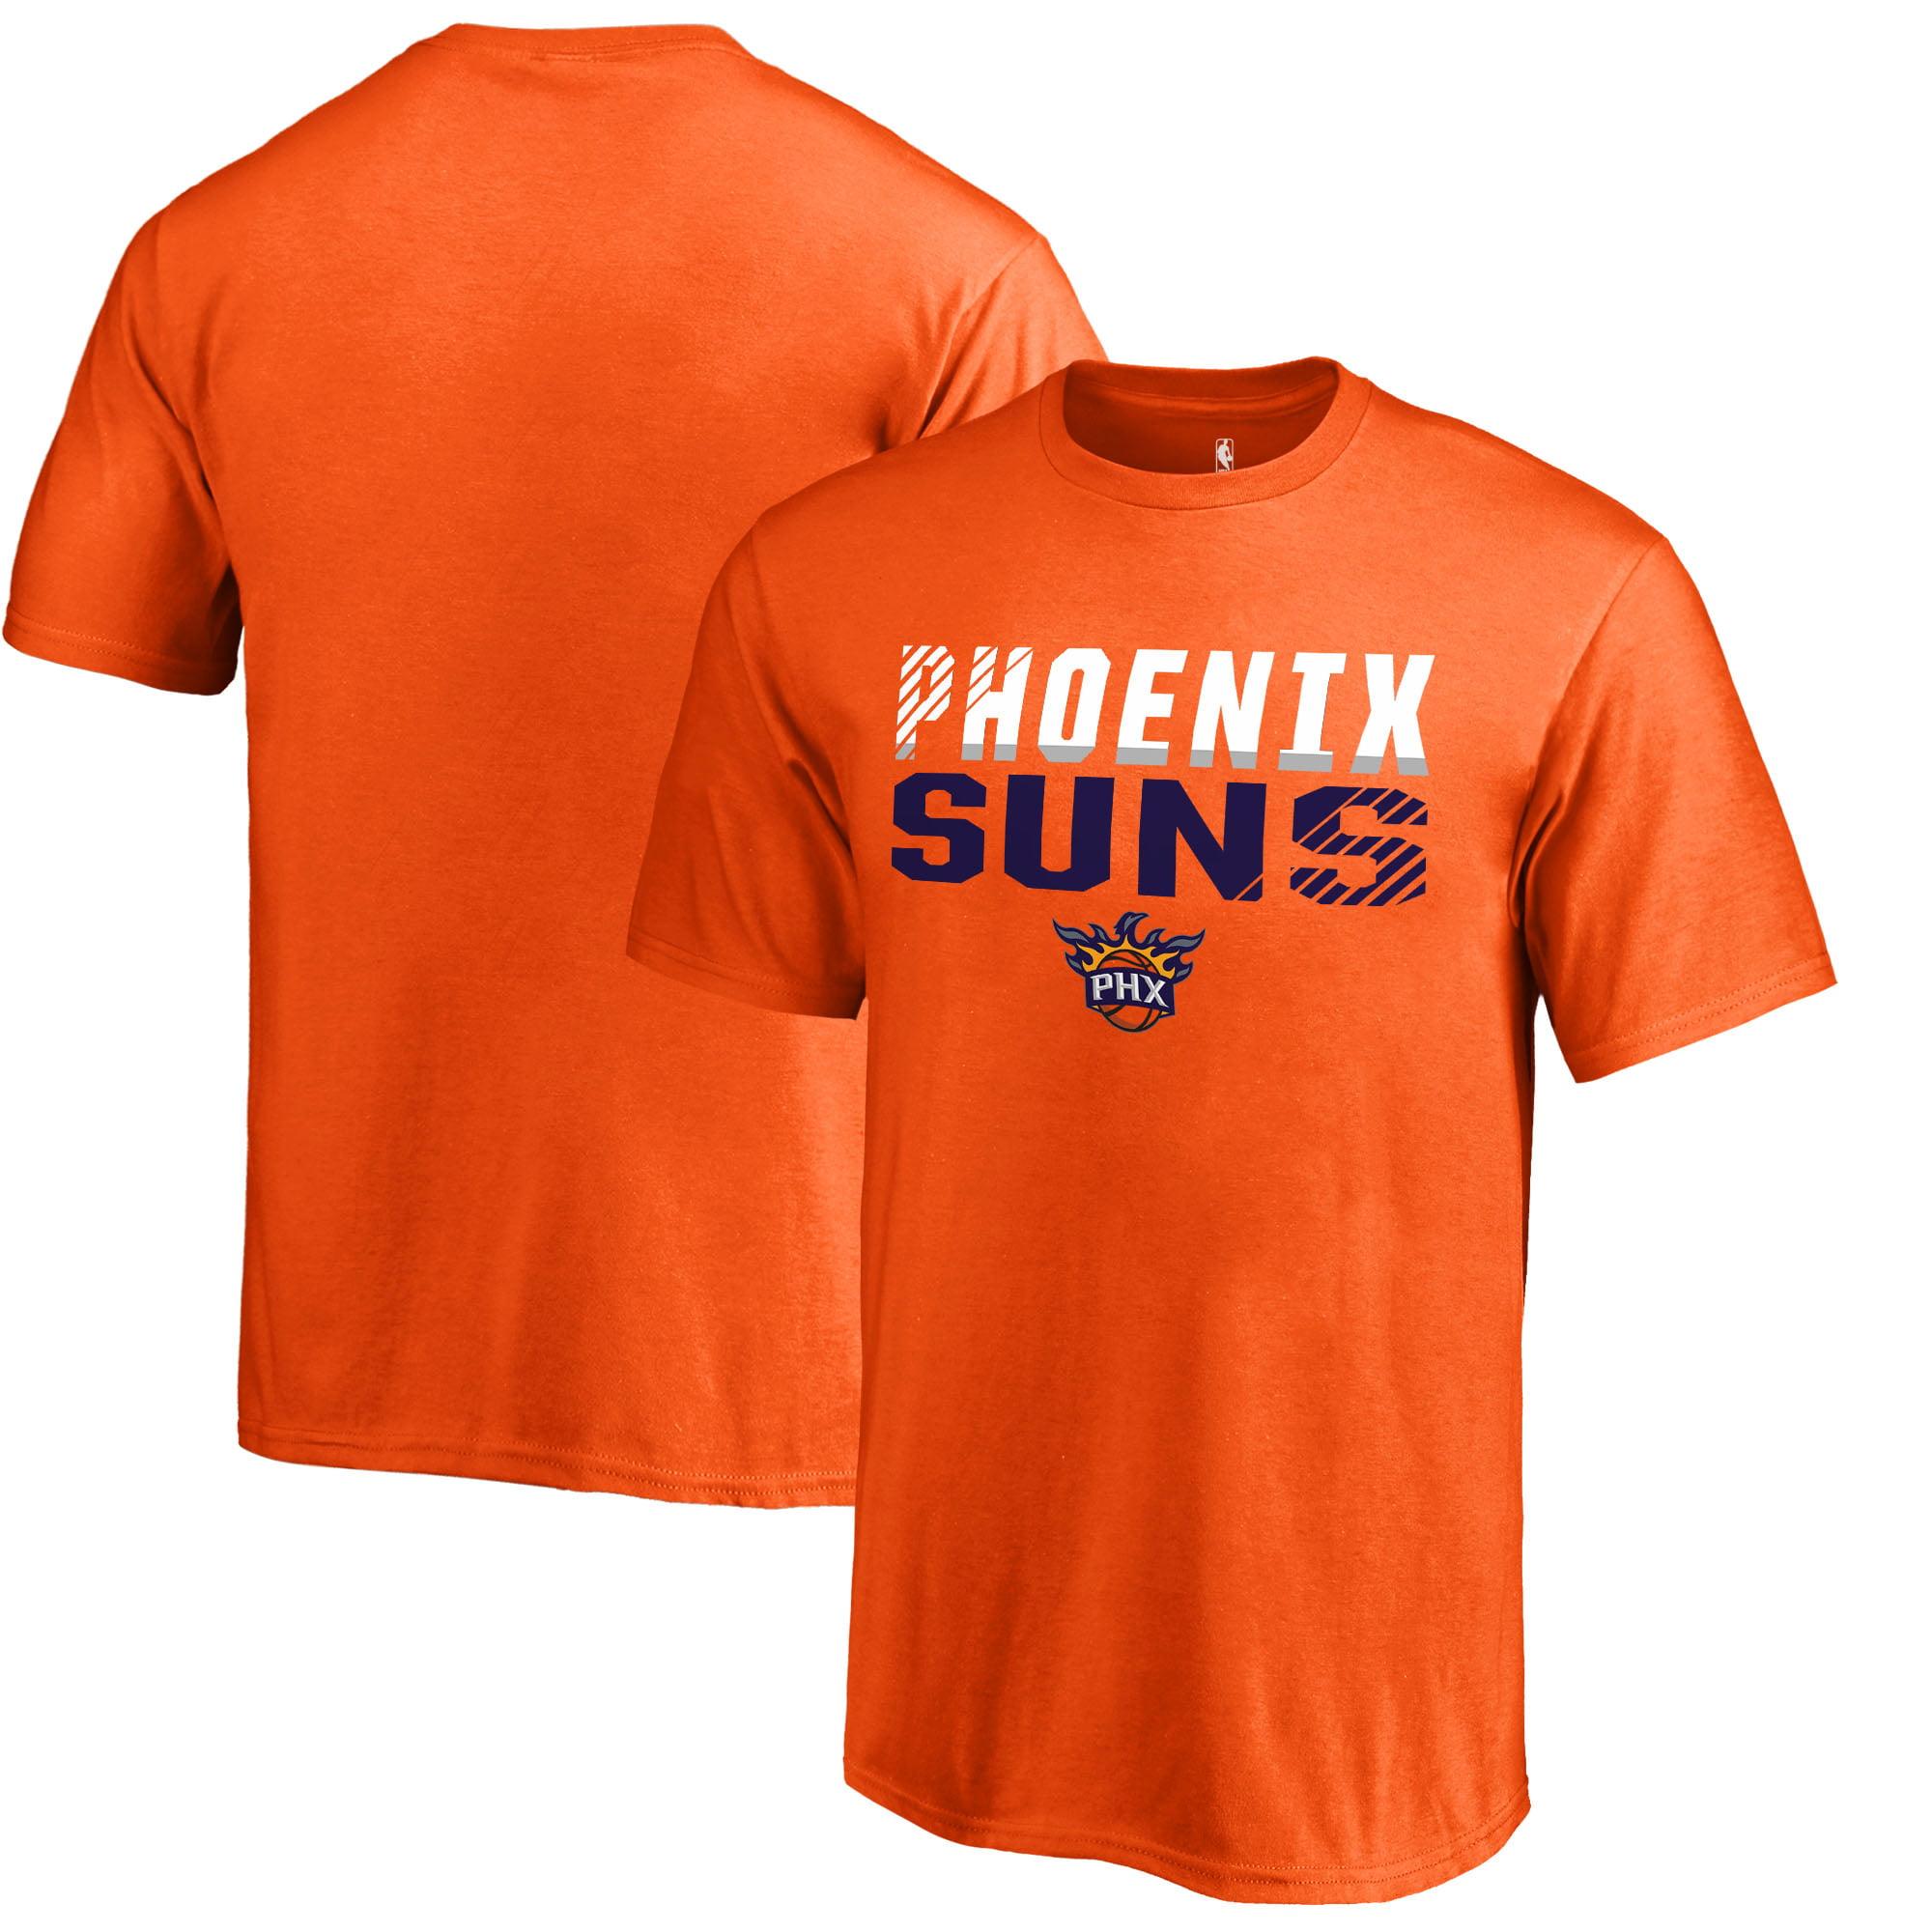 Phoenix Suns Fanatics Branded Youth Fade Out T-Shirt - Orange